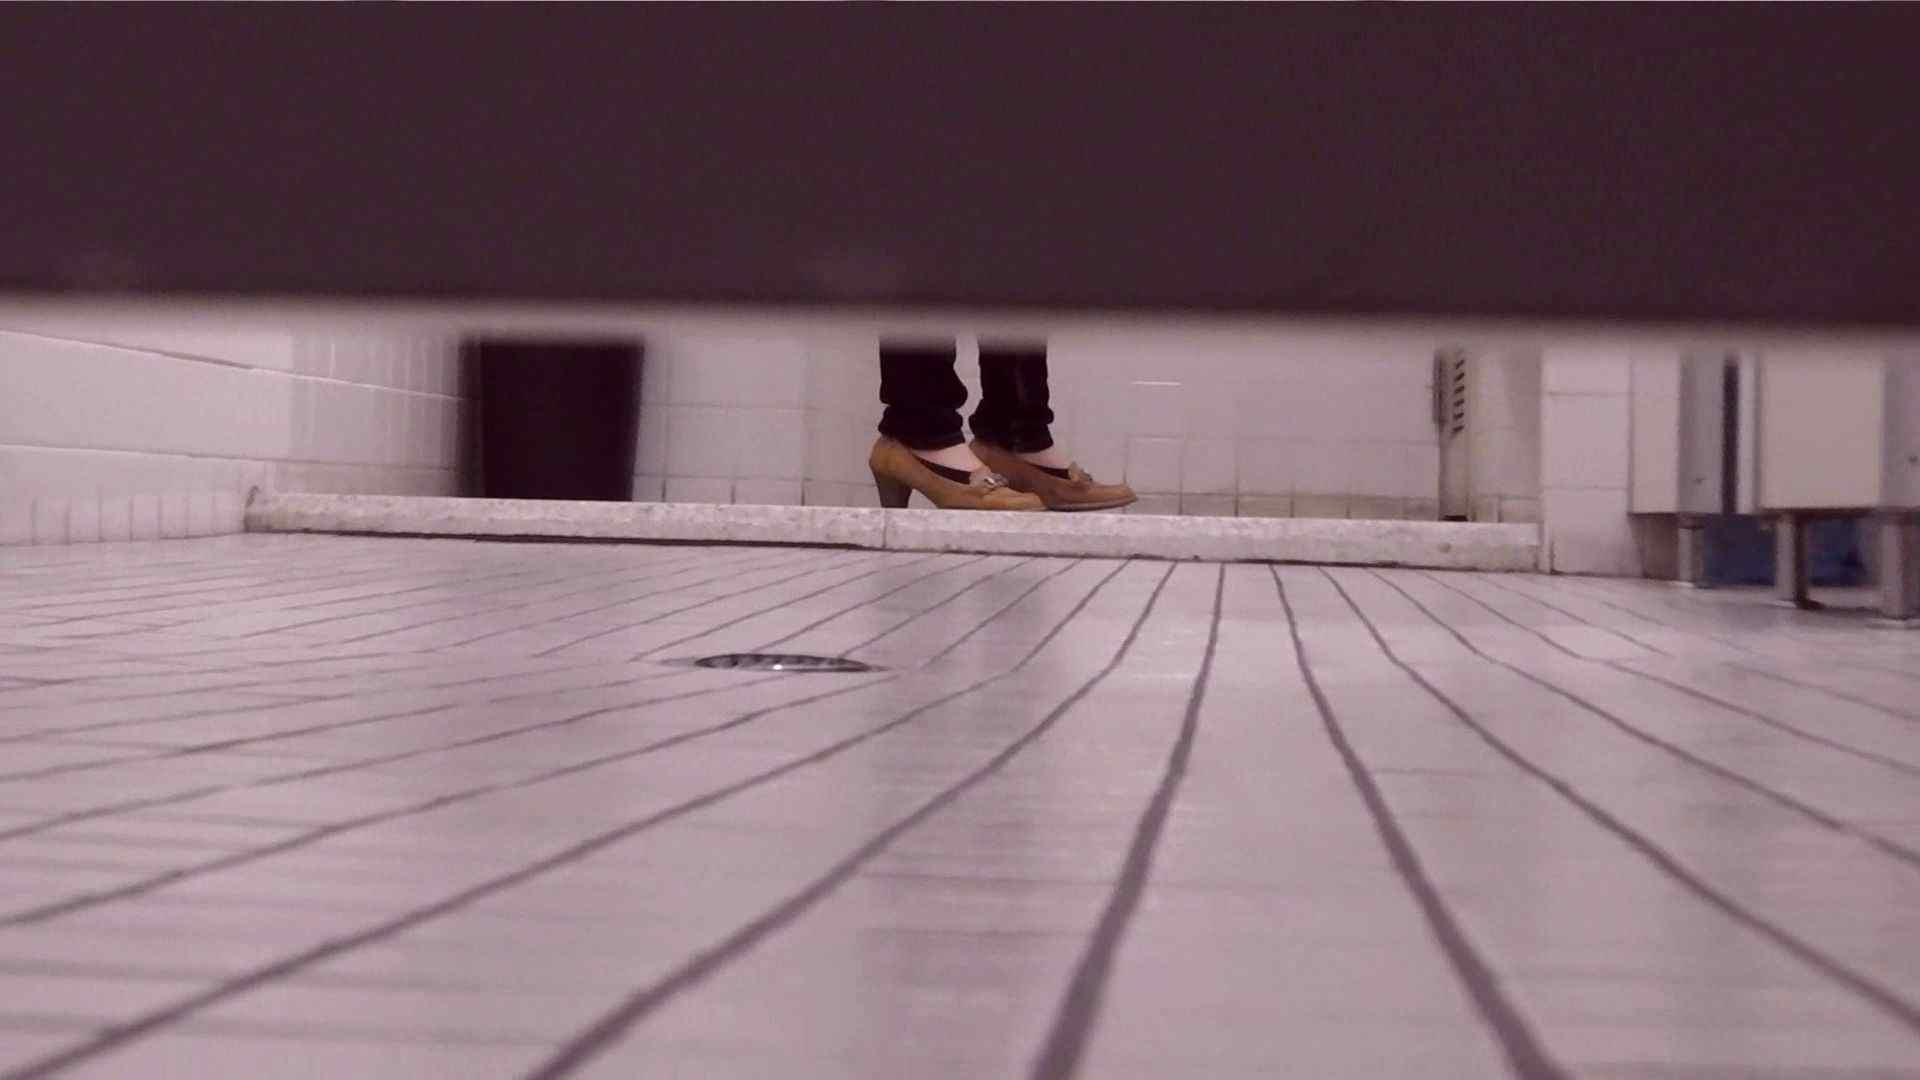 vol.17 命がけ潜伏洗面所! 張り裂けんばかりの大物 プライベート 盗撮ワレメ無修正動画無料 108画像 59